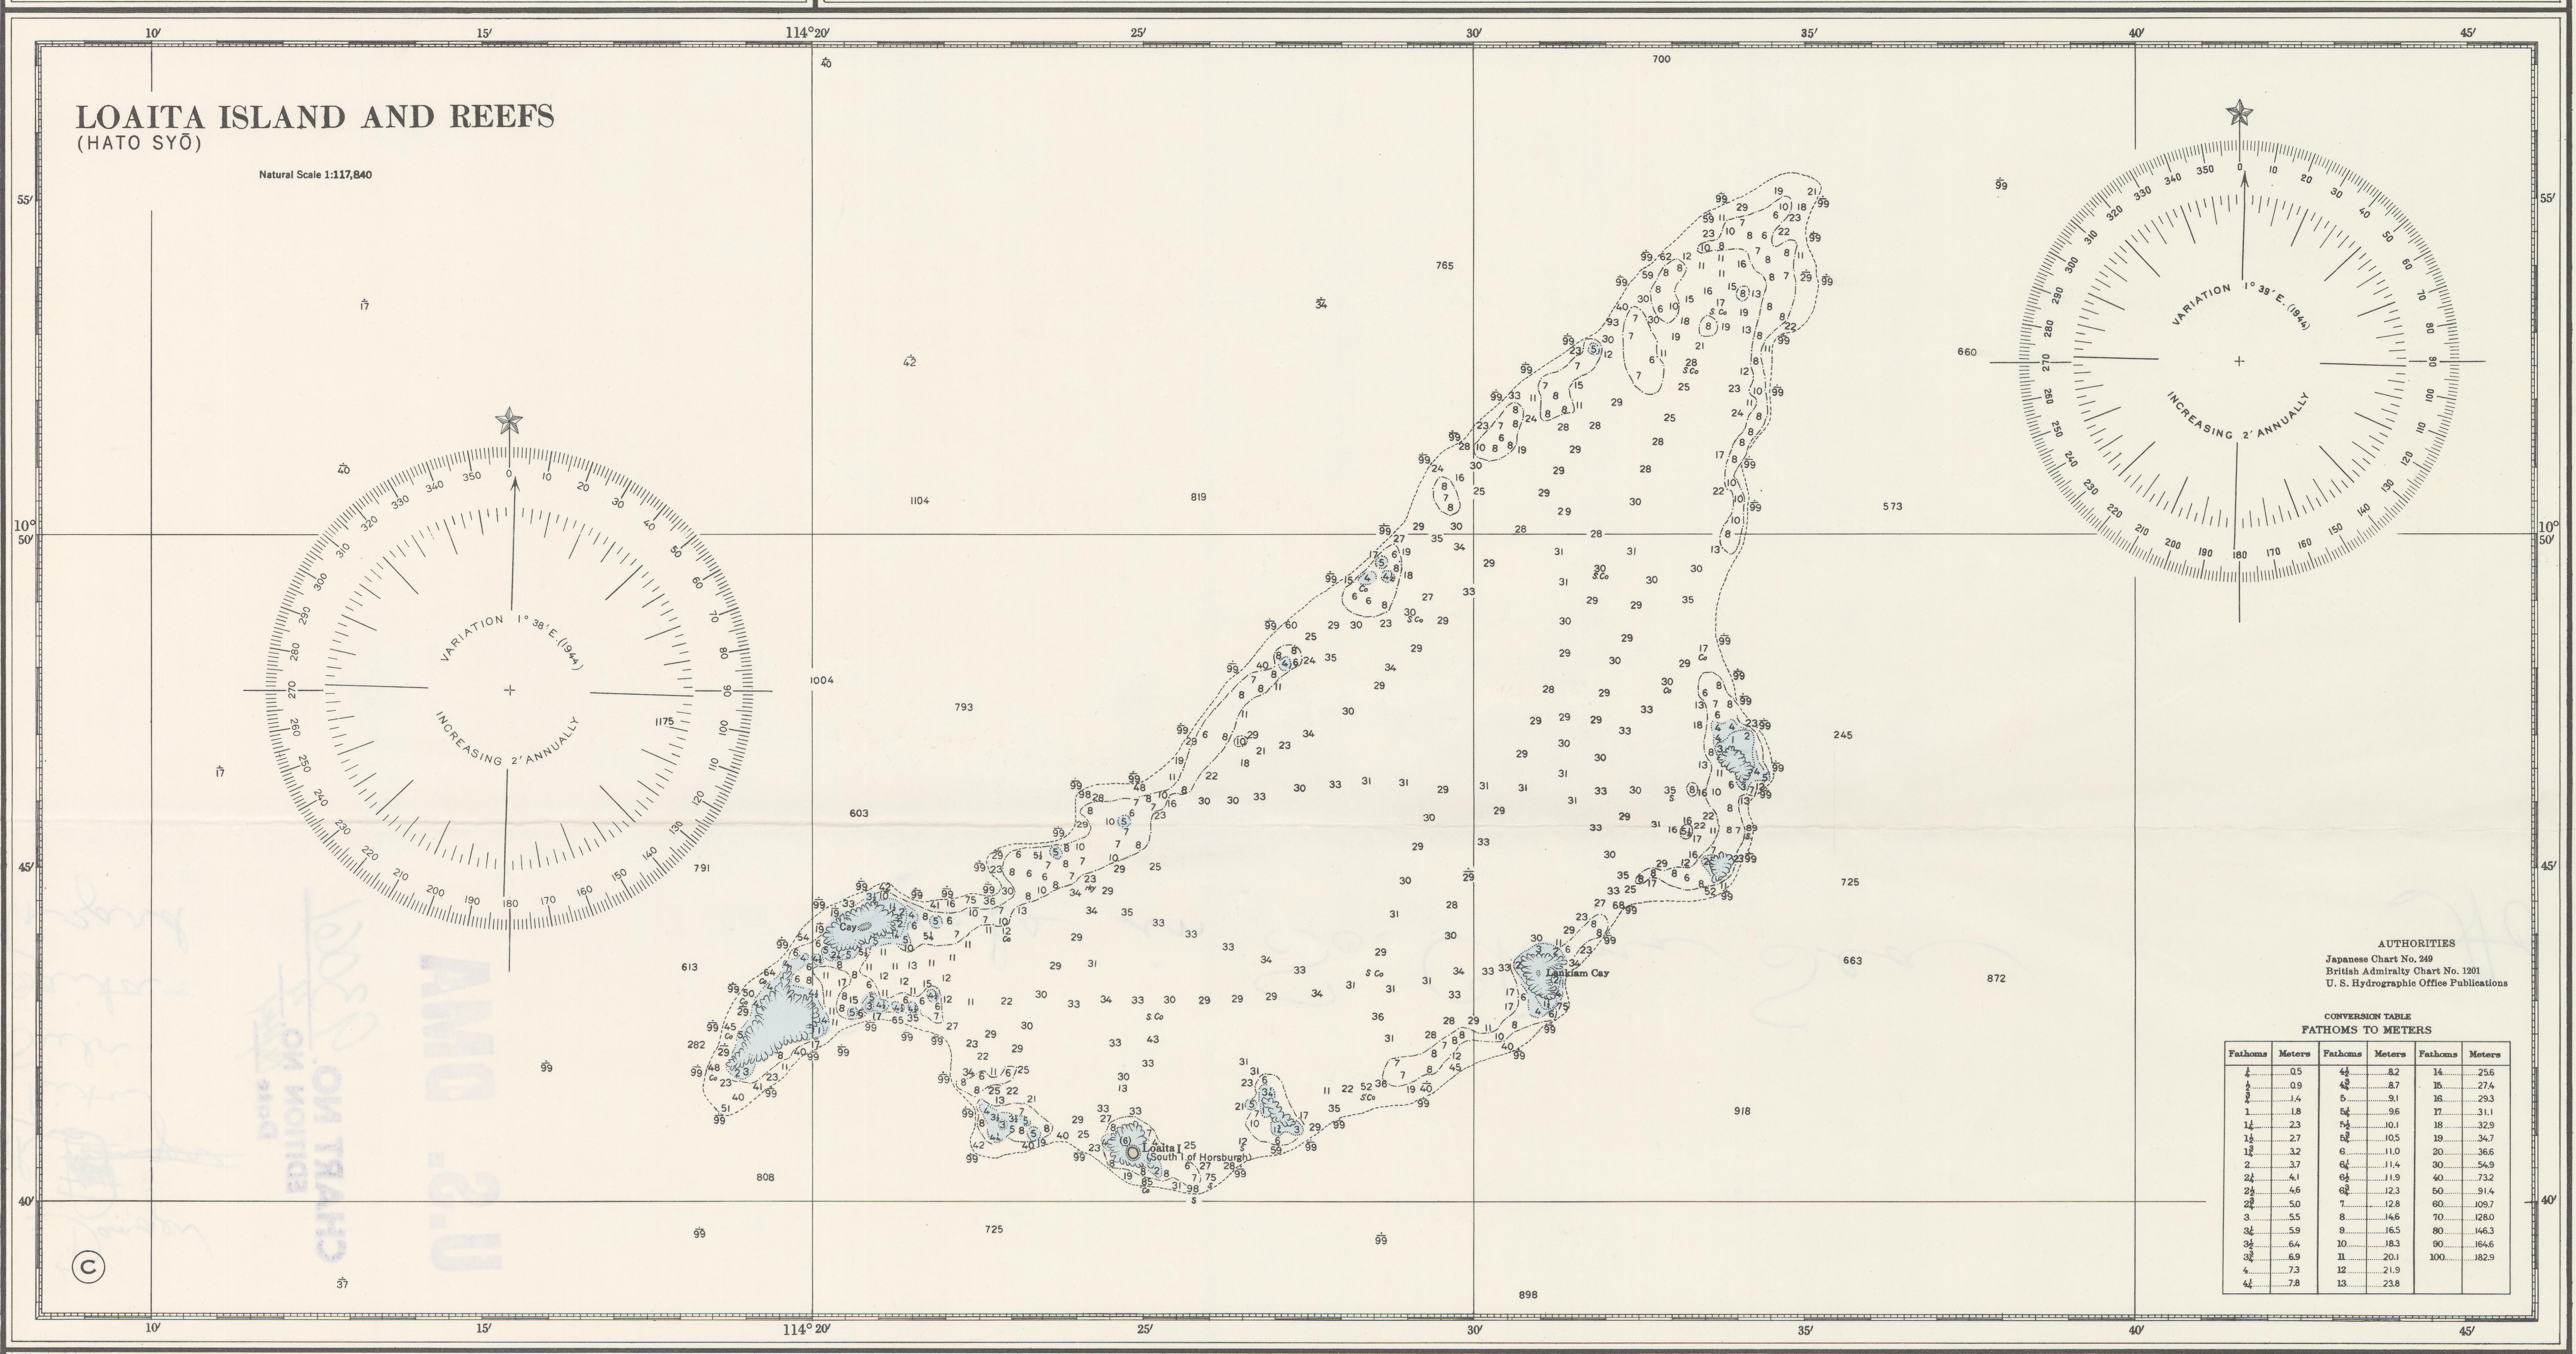 File Loaita Bank Nautical Chart Of 1911 Cropped Jpg Wikimedia Commons